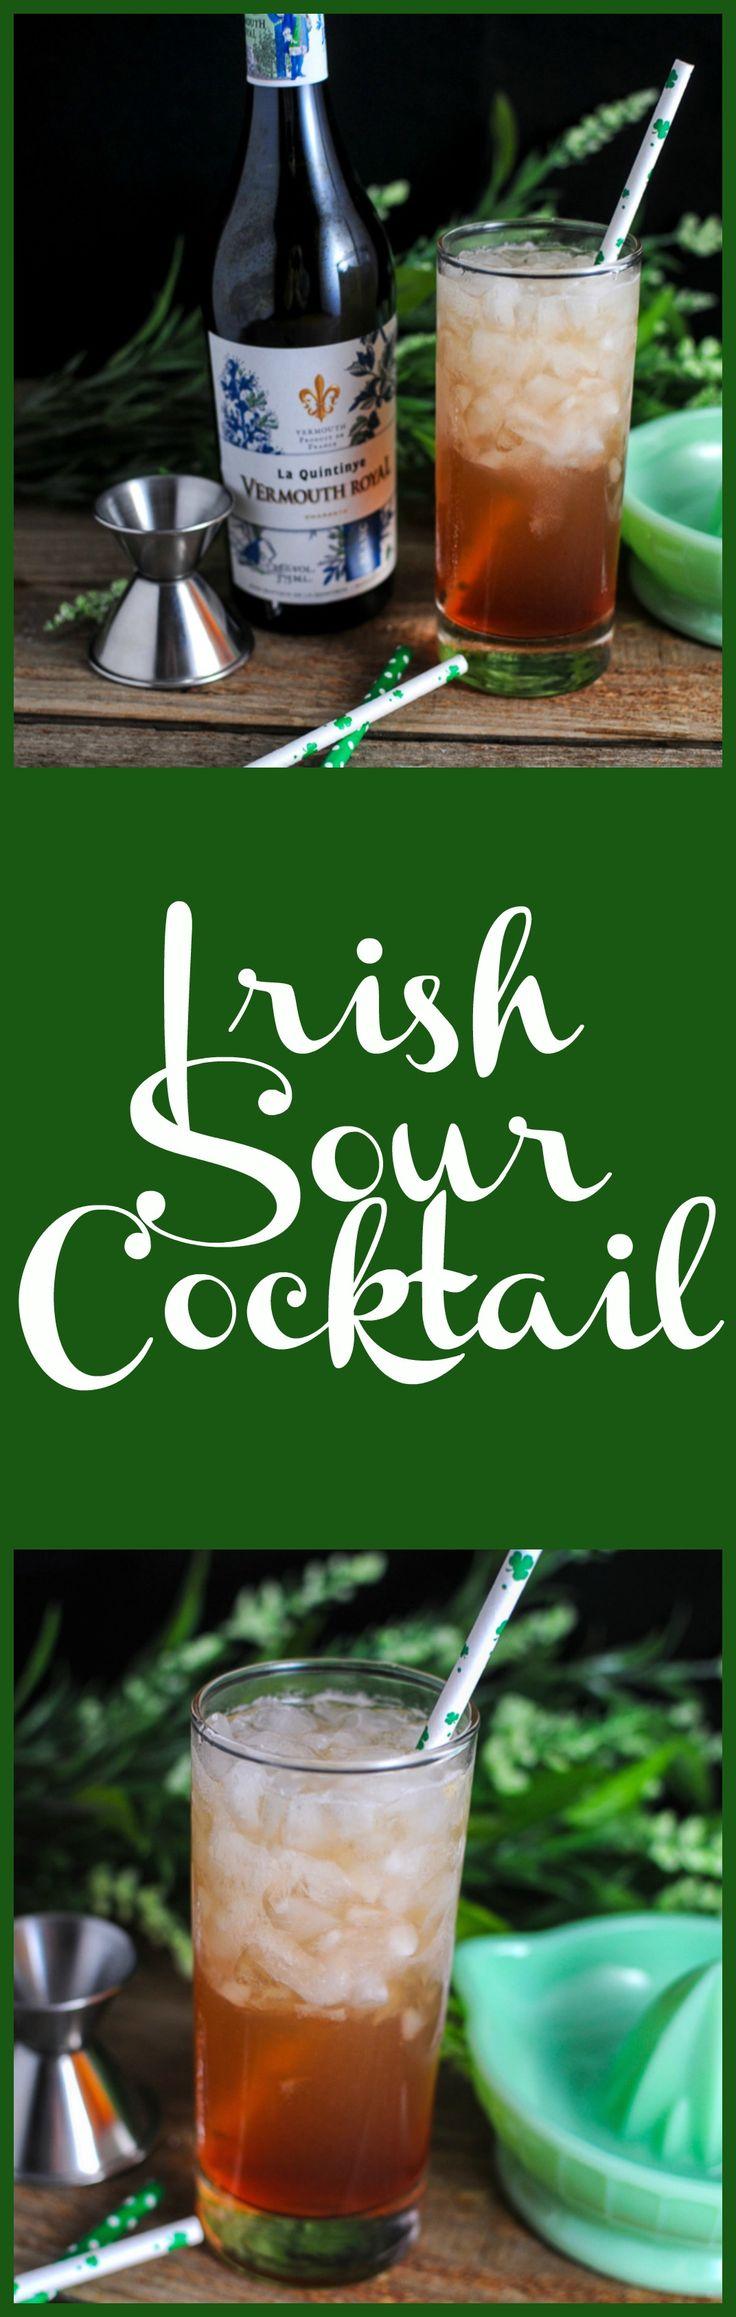 Irish Sour Cocktail, Whiskey, grapefruit, white vermouth, grenadine, Luxardo Maraschino, lemon